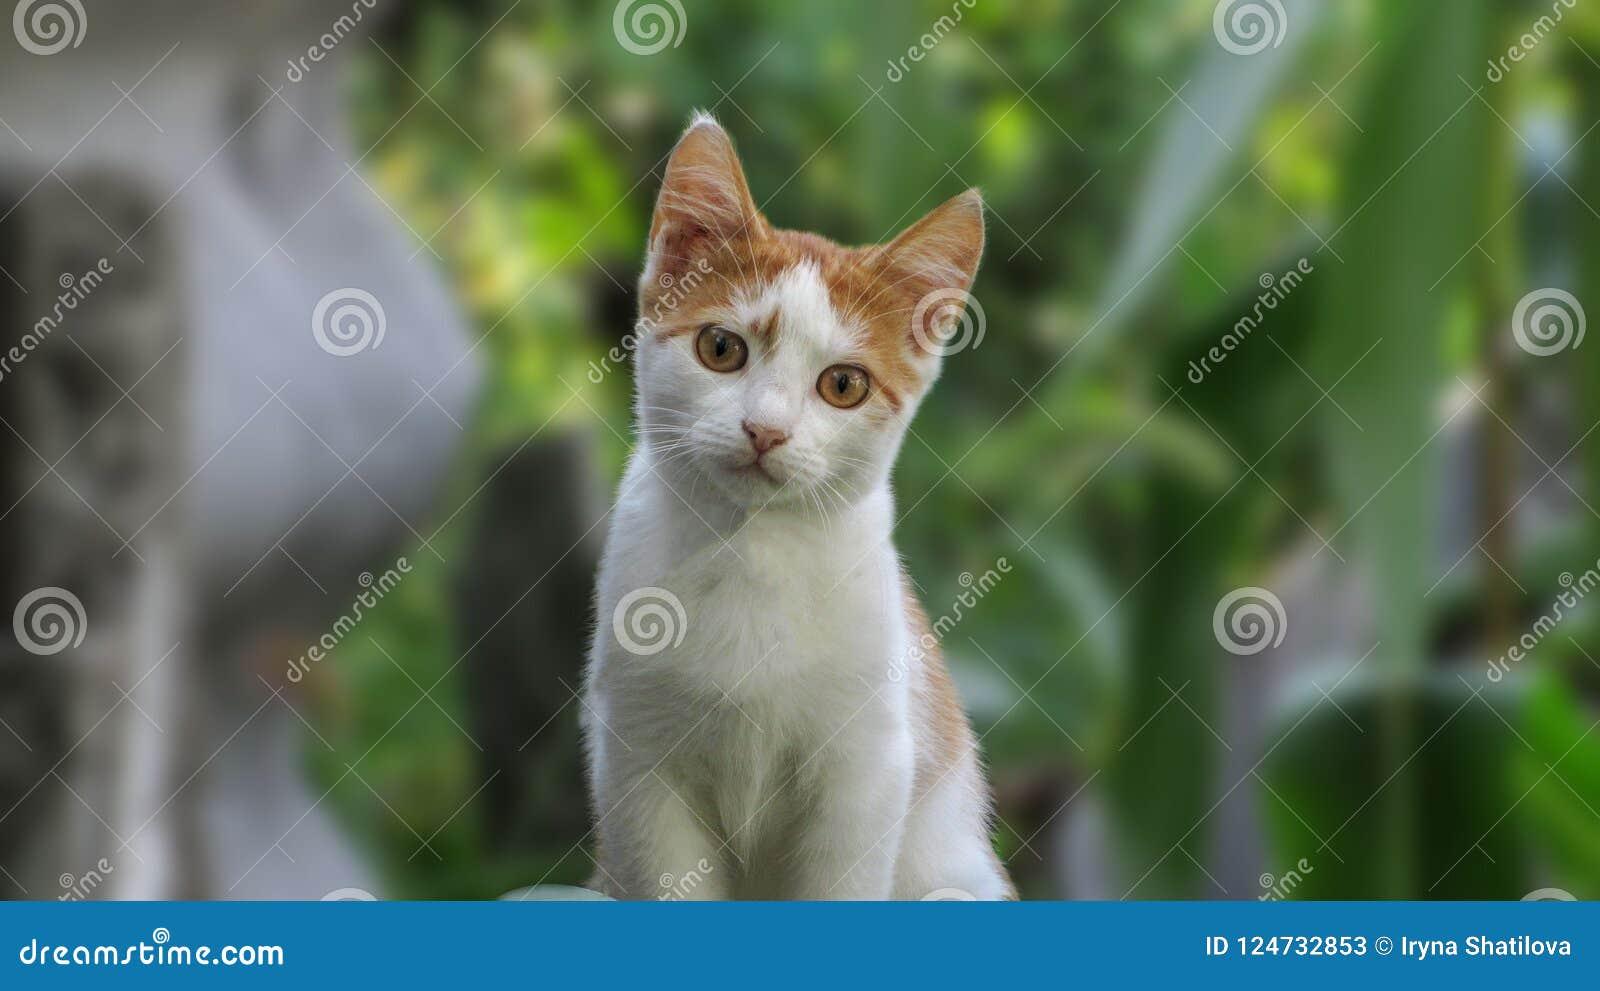 Little Fluffy Kitten On The Street Stock Image - Image of nature ...